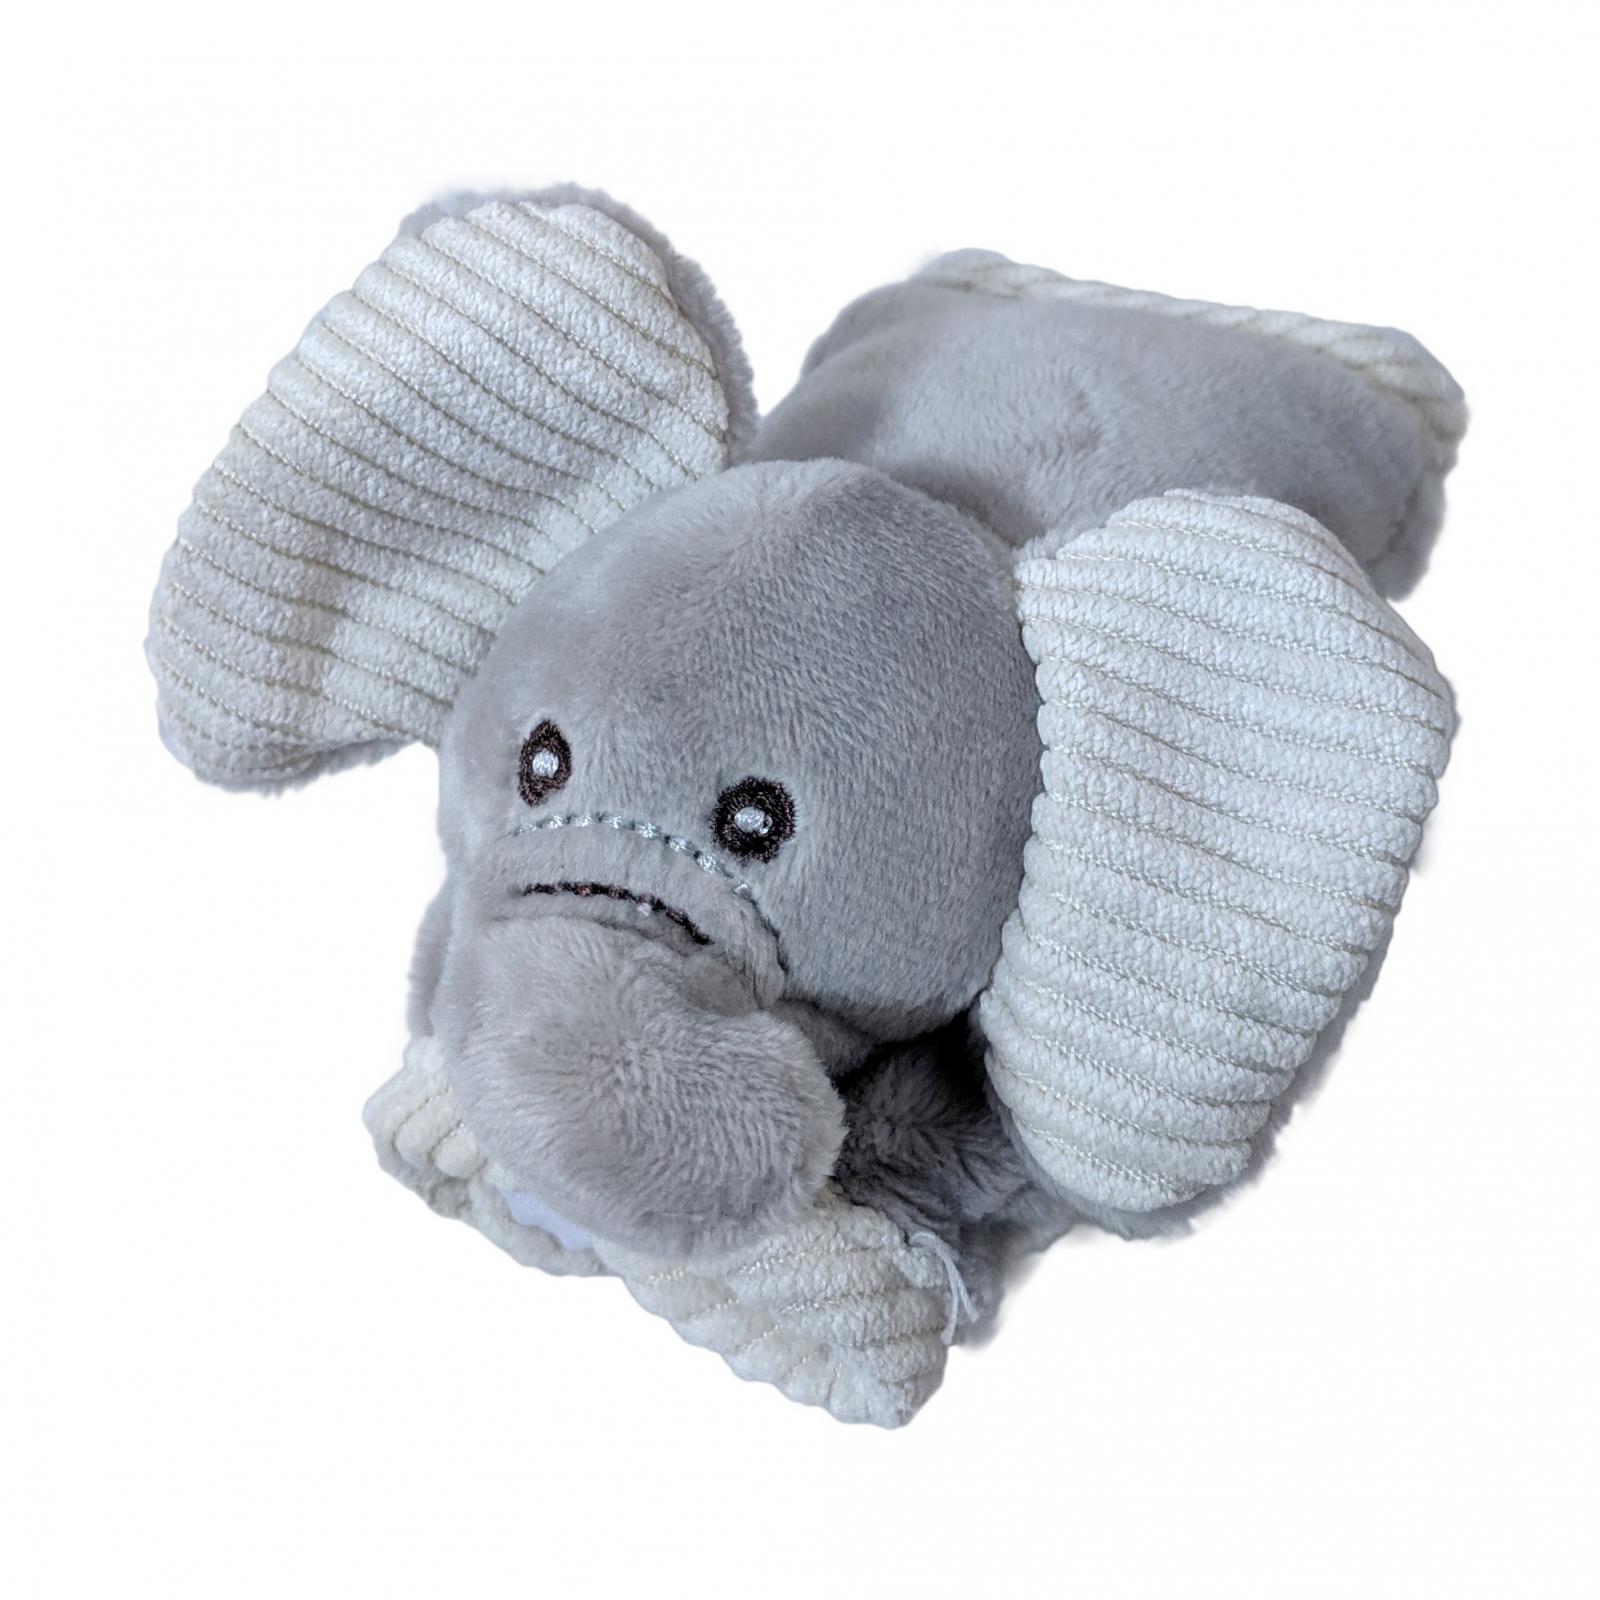 TychoTyke Baby Travel Elephant Seat Belt Covers Car Seat Grey with Corduroy Trim